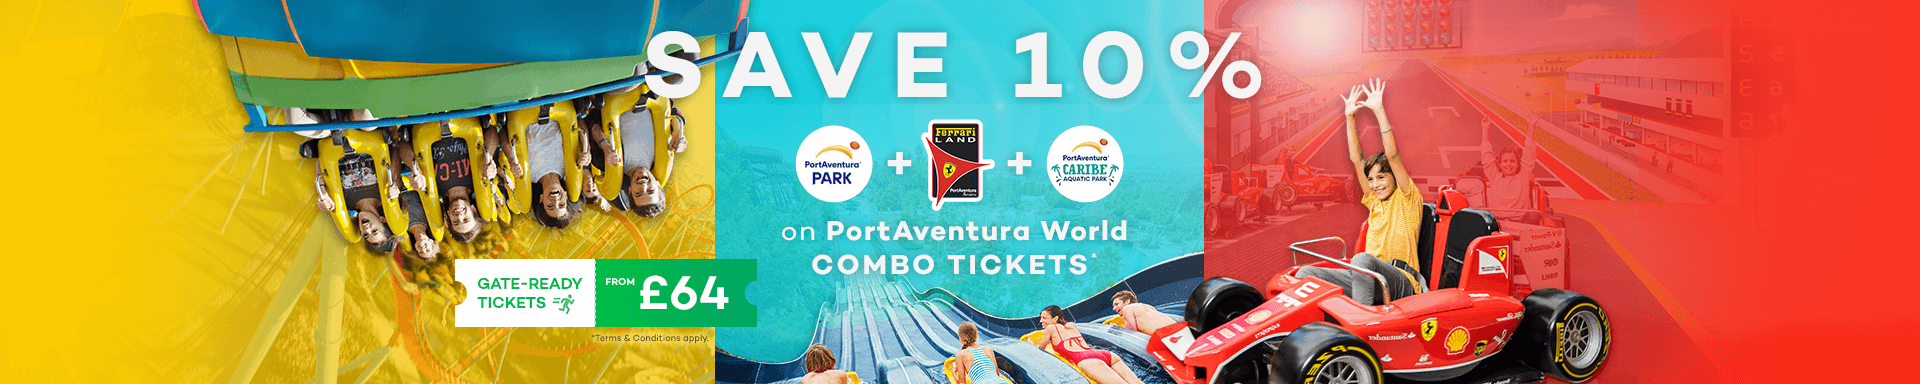 PortAventura Tickets